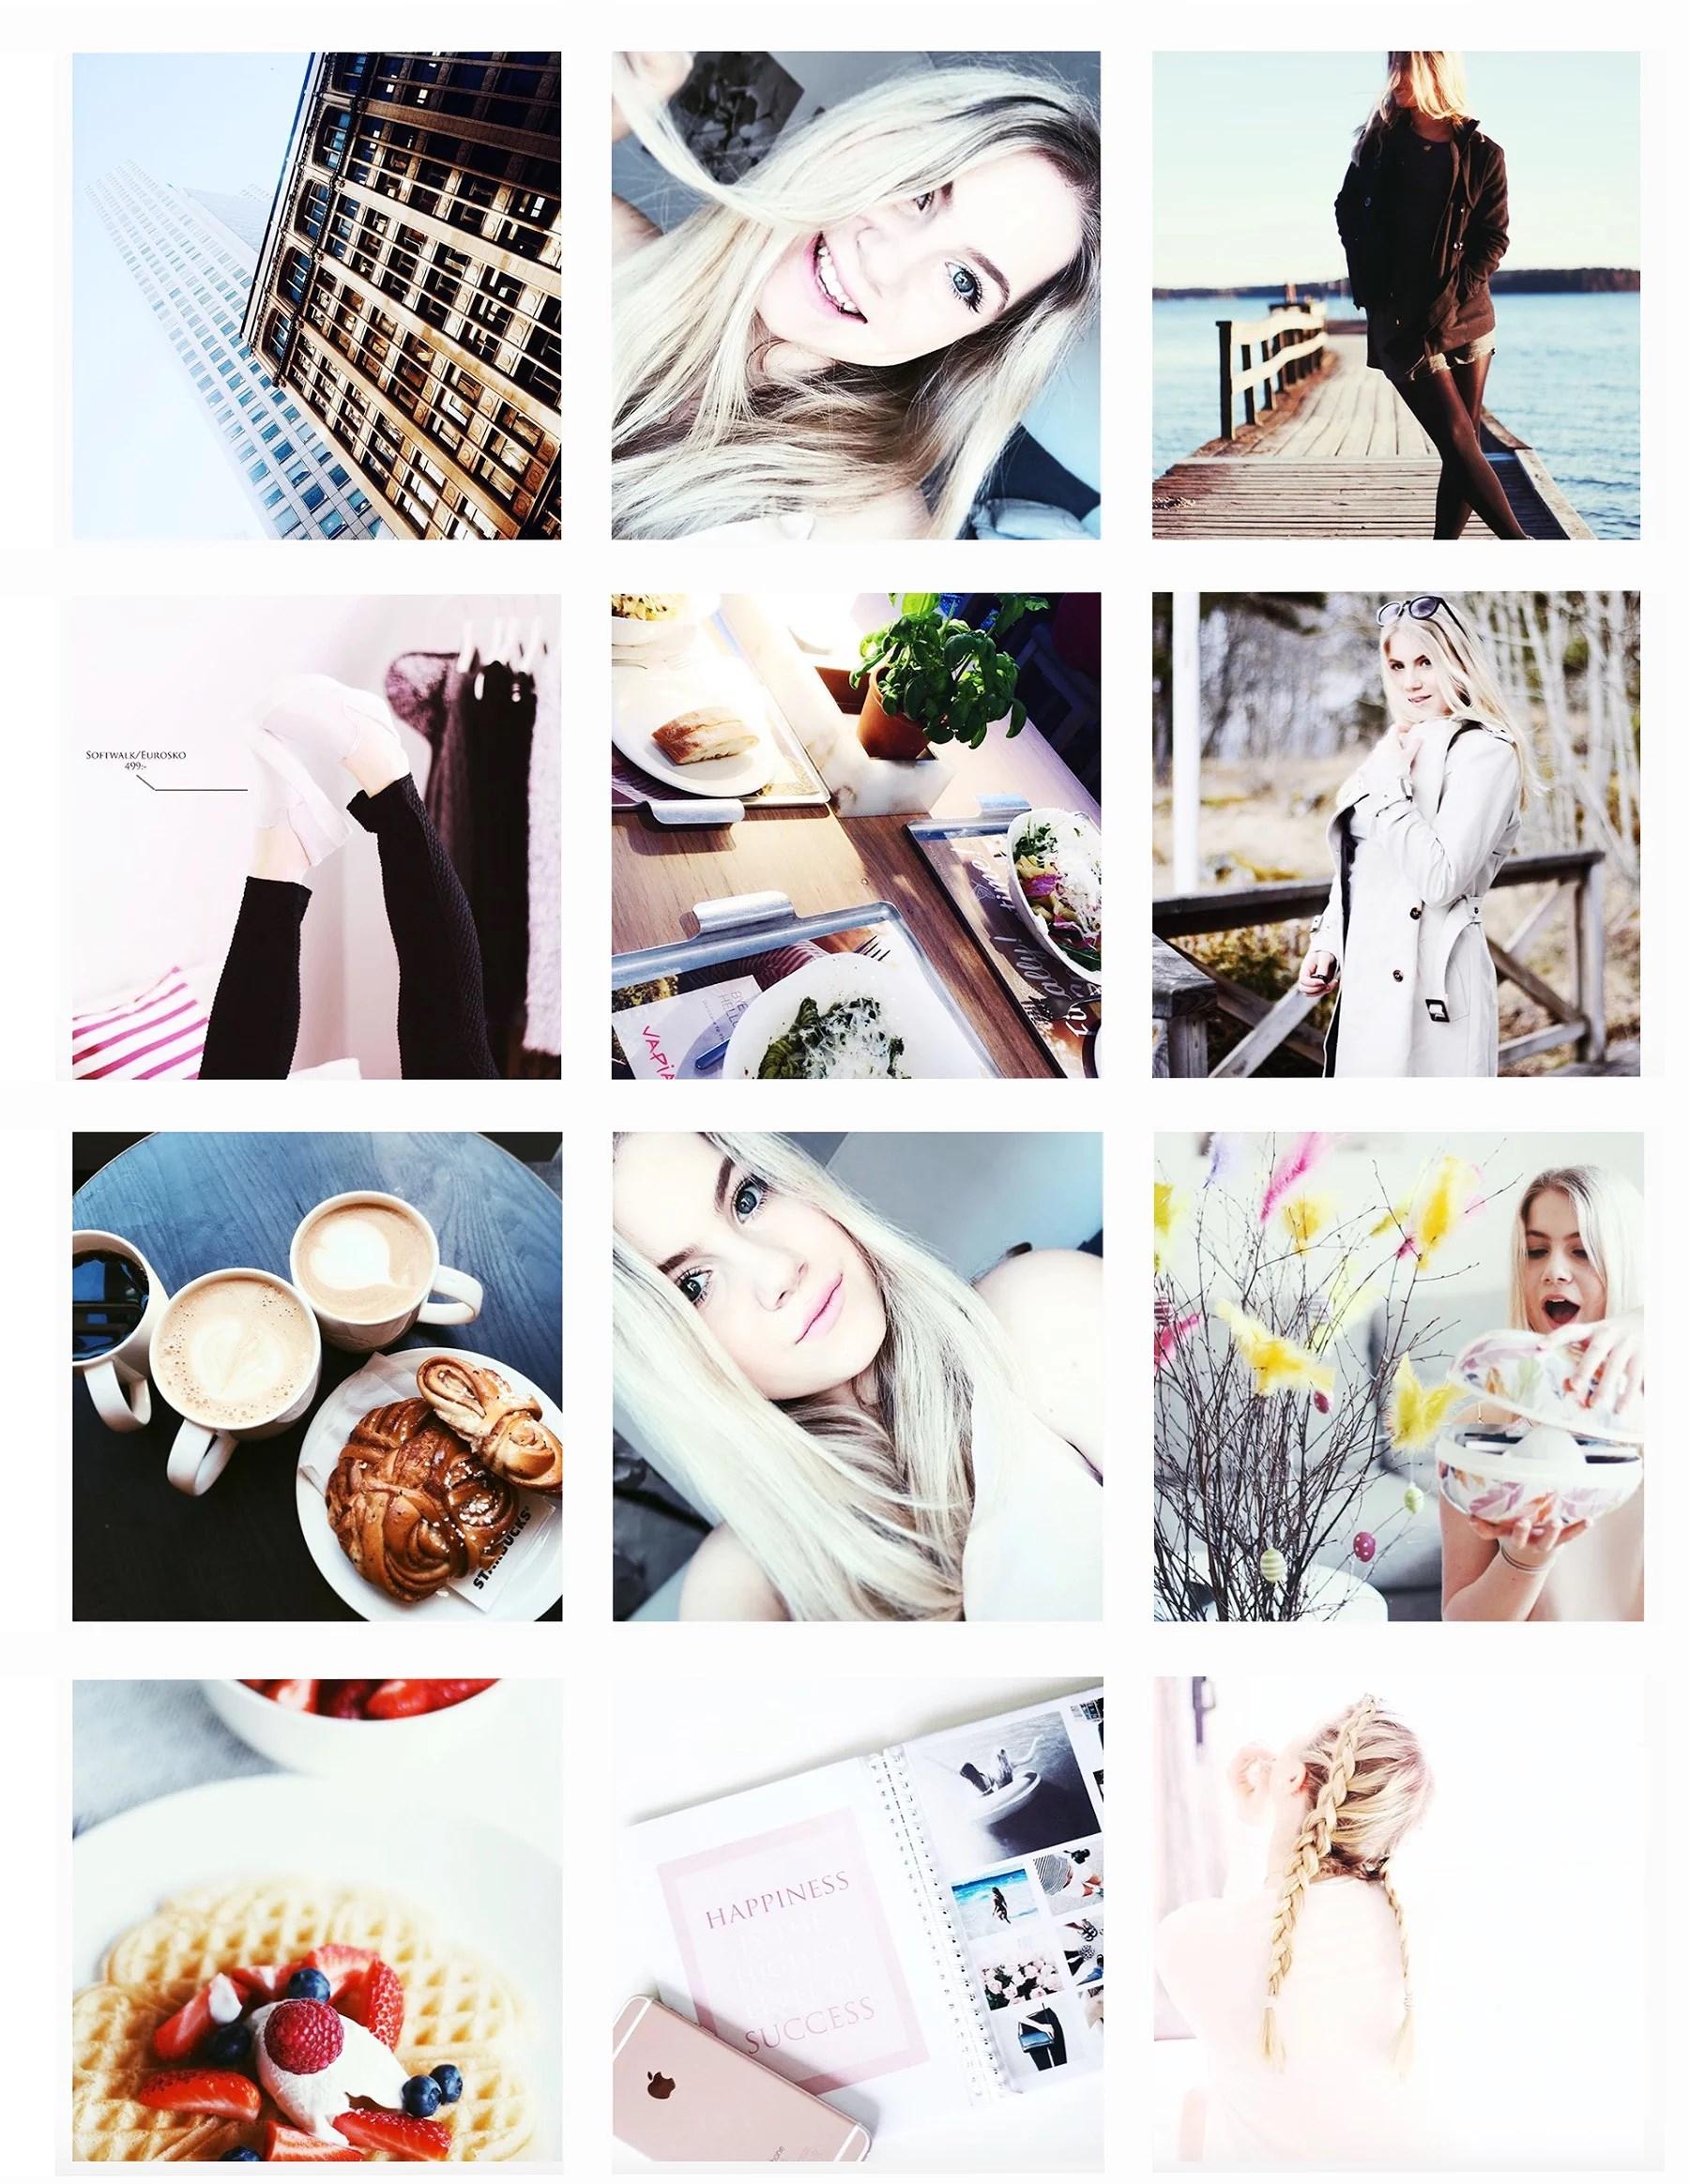 Instagram lately